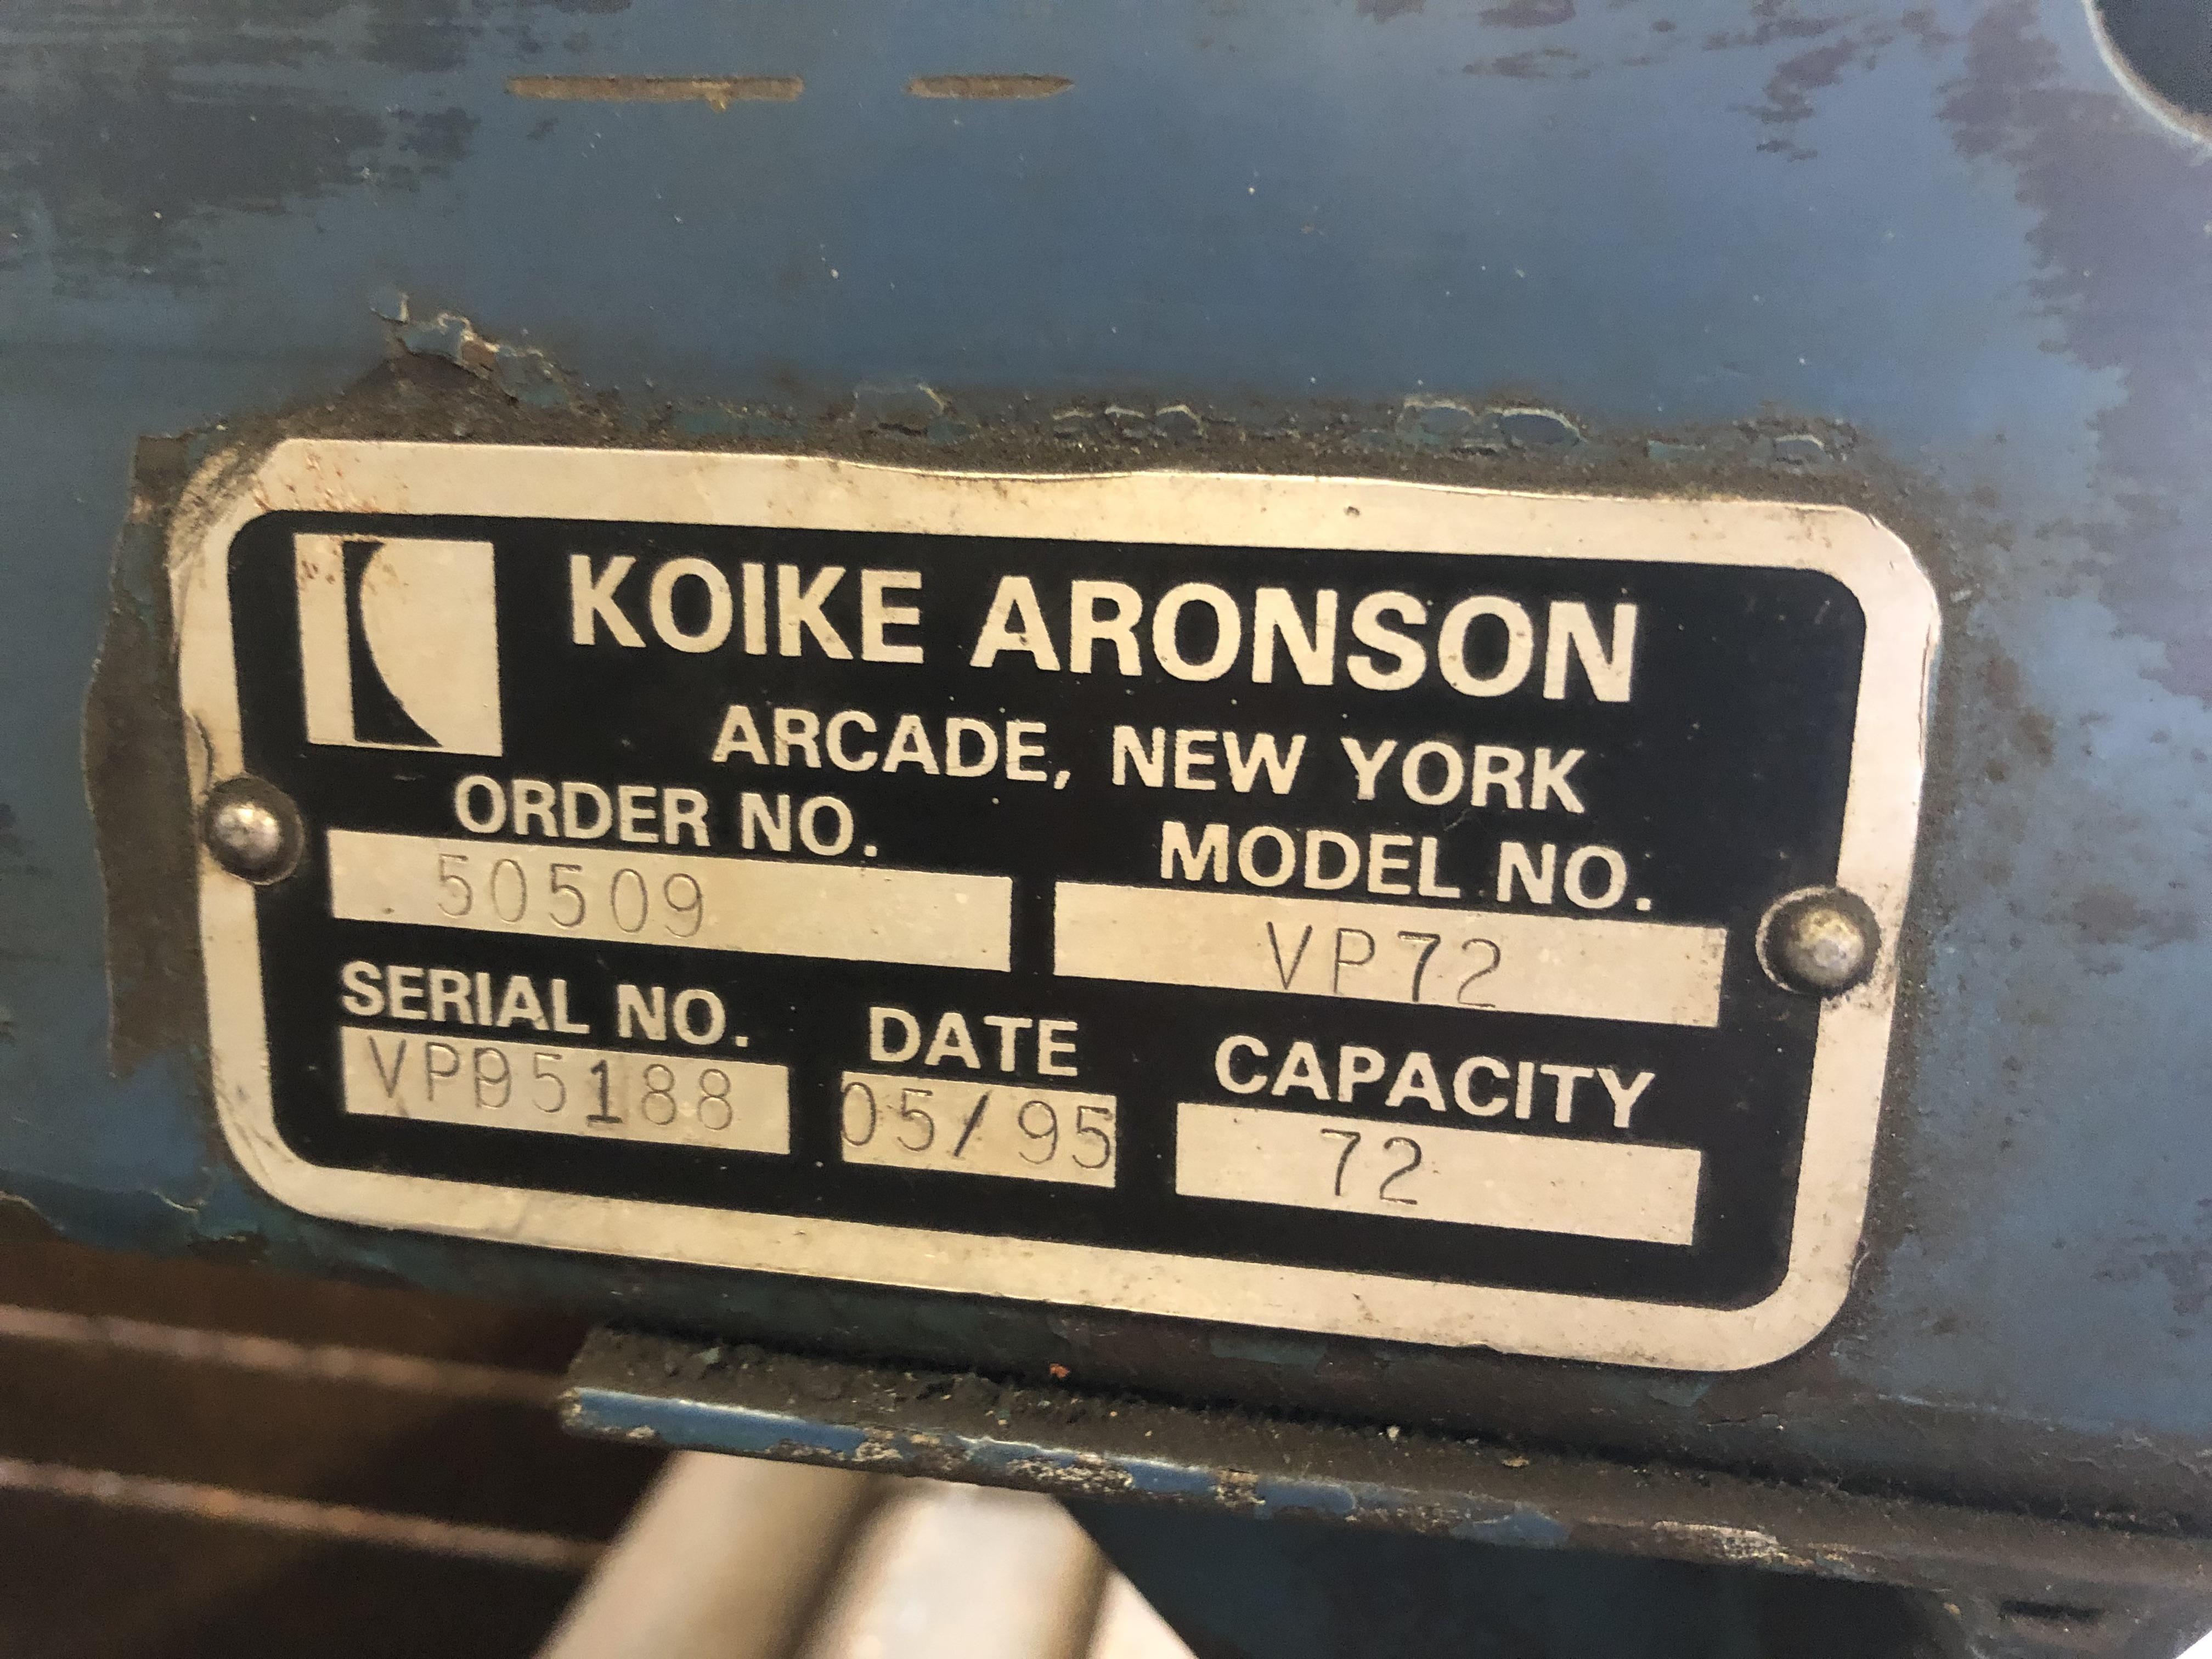 6' X 12' KOIKE ARONSON MODEL VP72 PLASMA TABLE: STOCK #10732